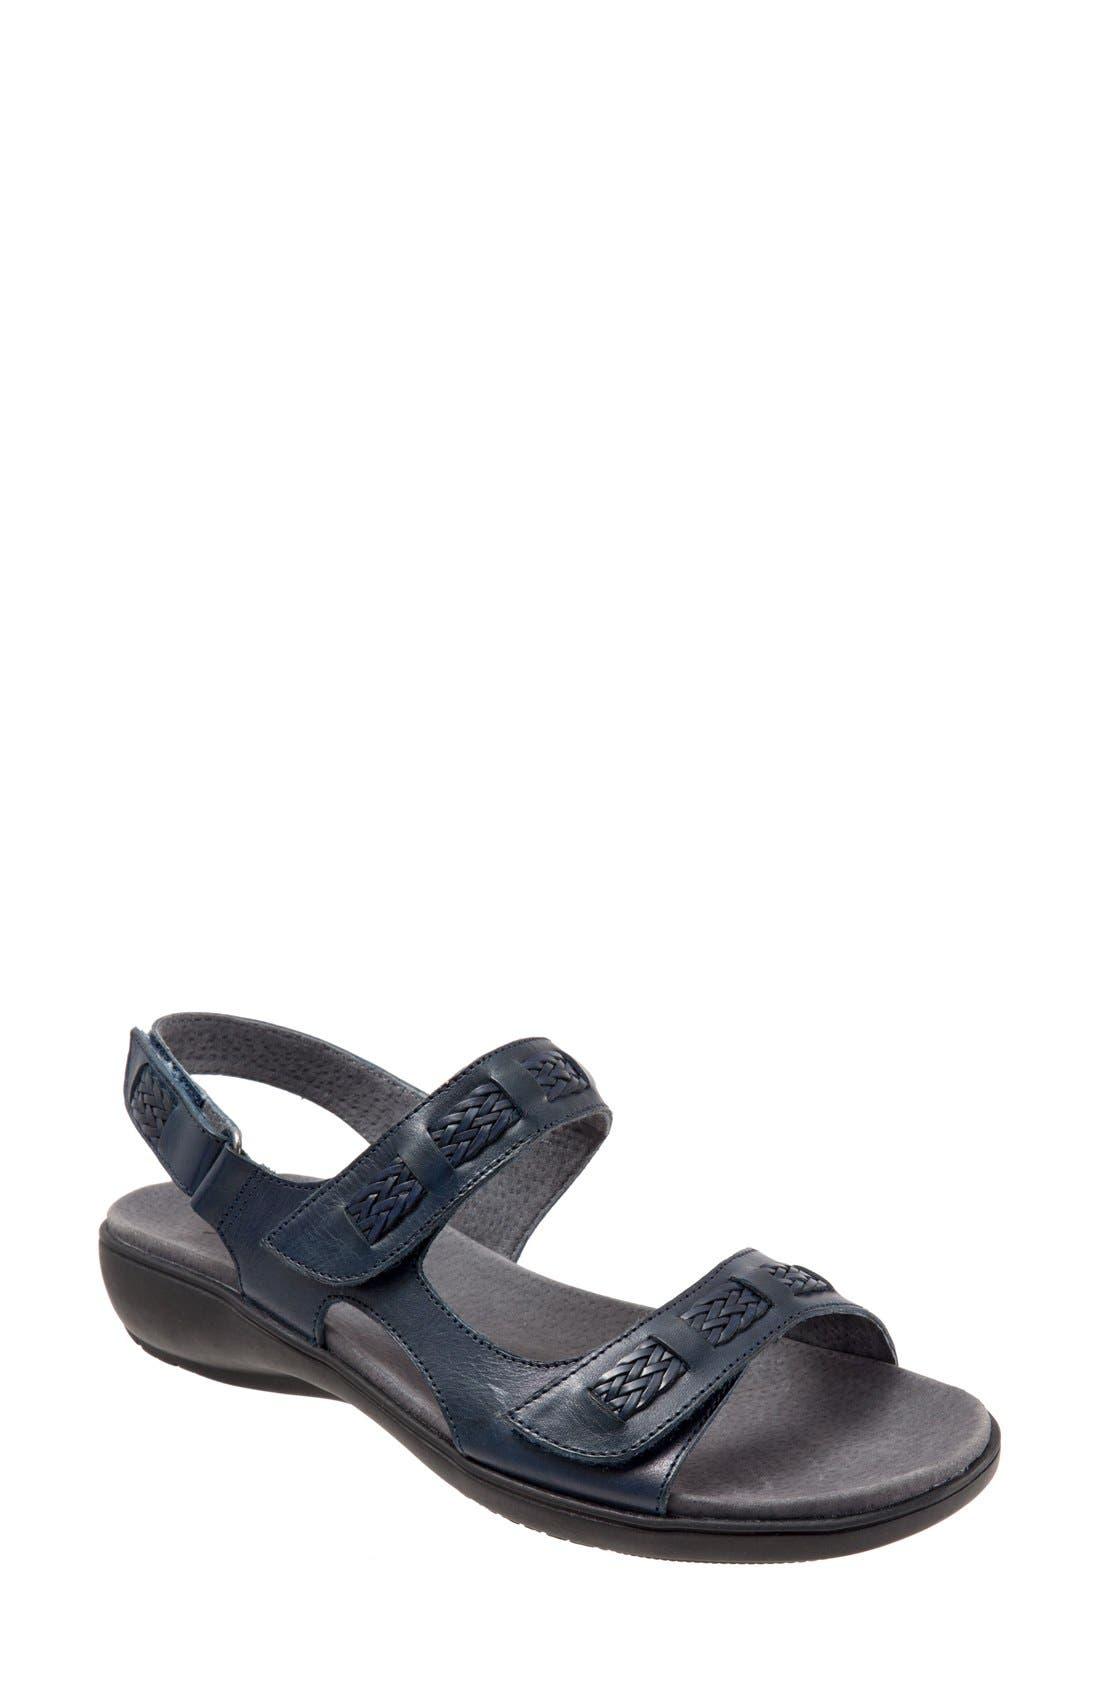 'Kip' Sandal,                         Main,                         color, Navy Leather